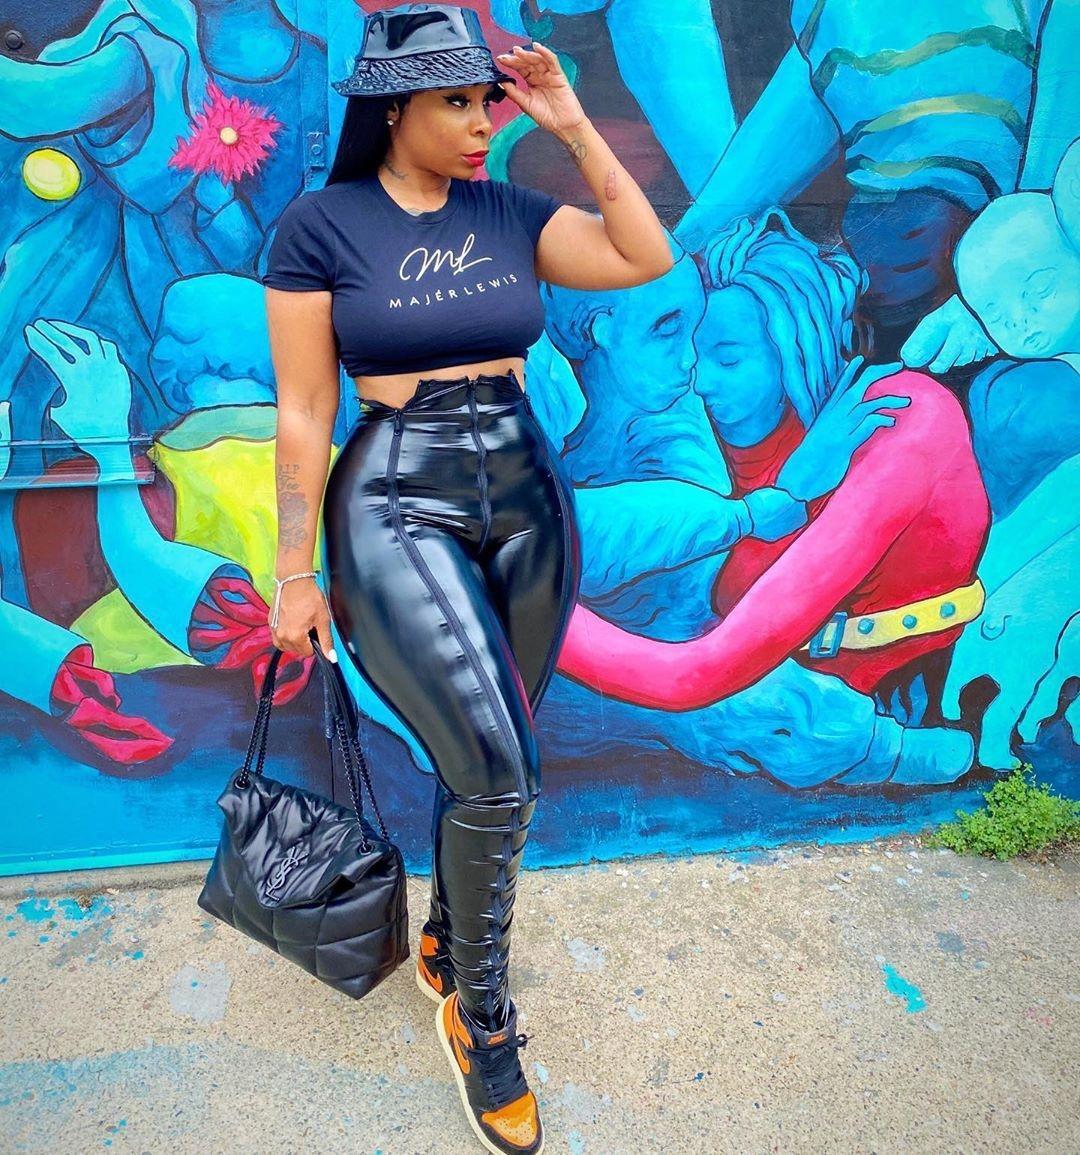 N43E Slim New Cintura alta de alta cintura Sello de oro Pantalones Yoga Impreso Fitness Hip 2019 Leggings Negros Pantalones de yoga de algodón